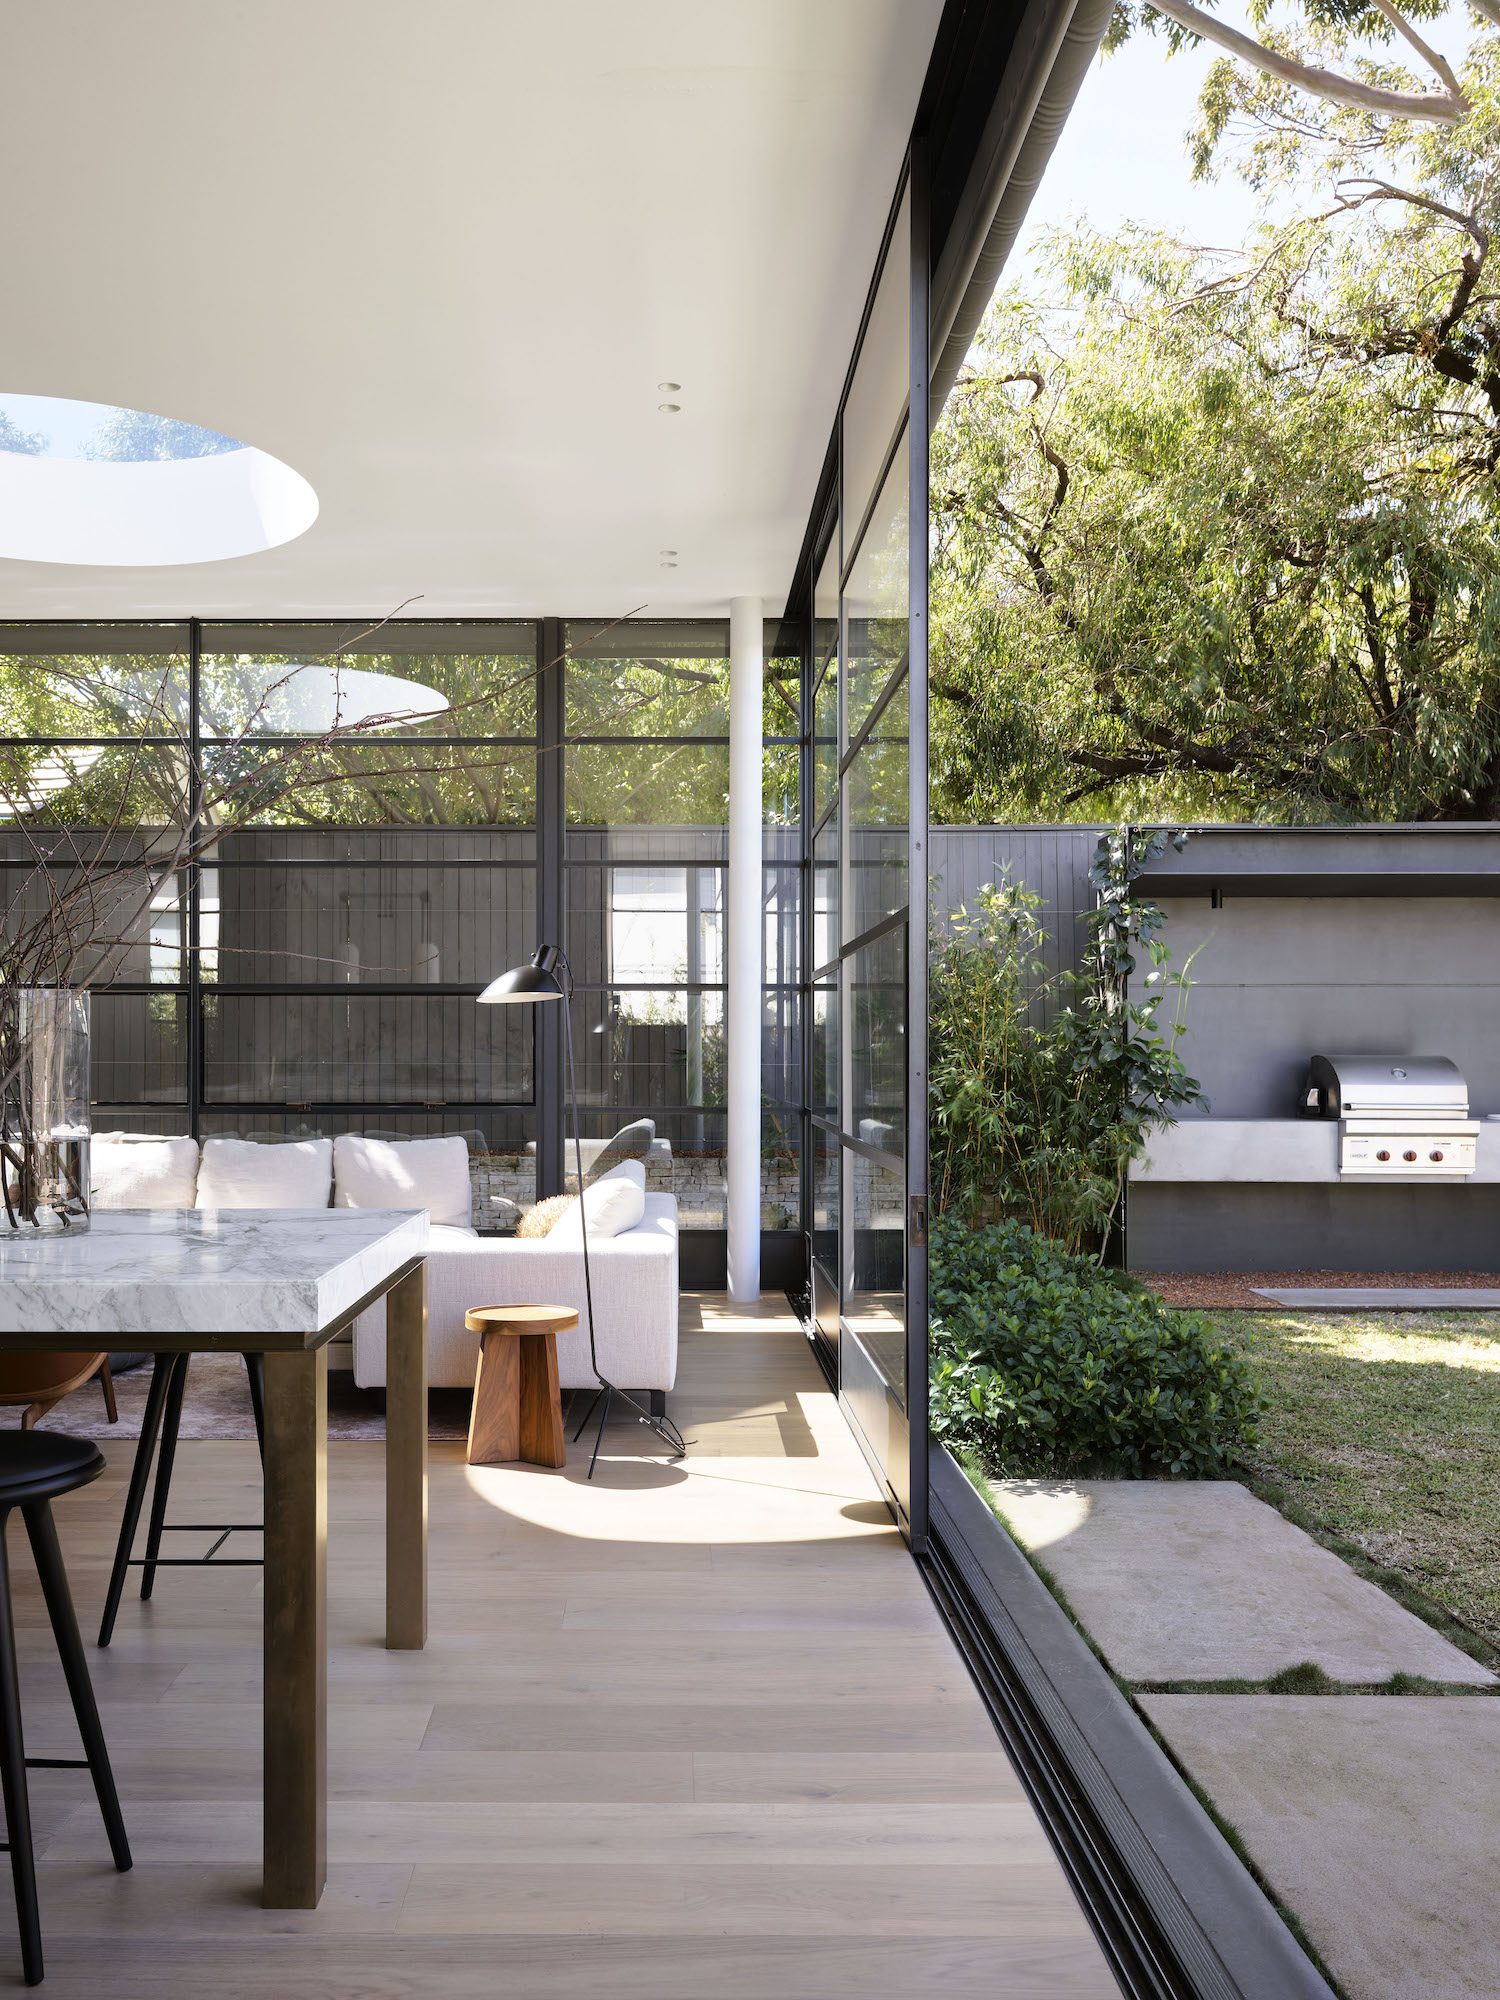 est living bellevue hill house pohio adams architects 08